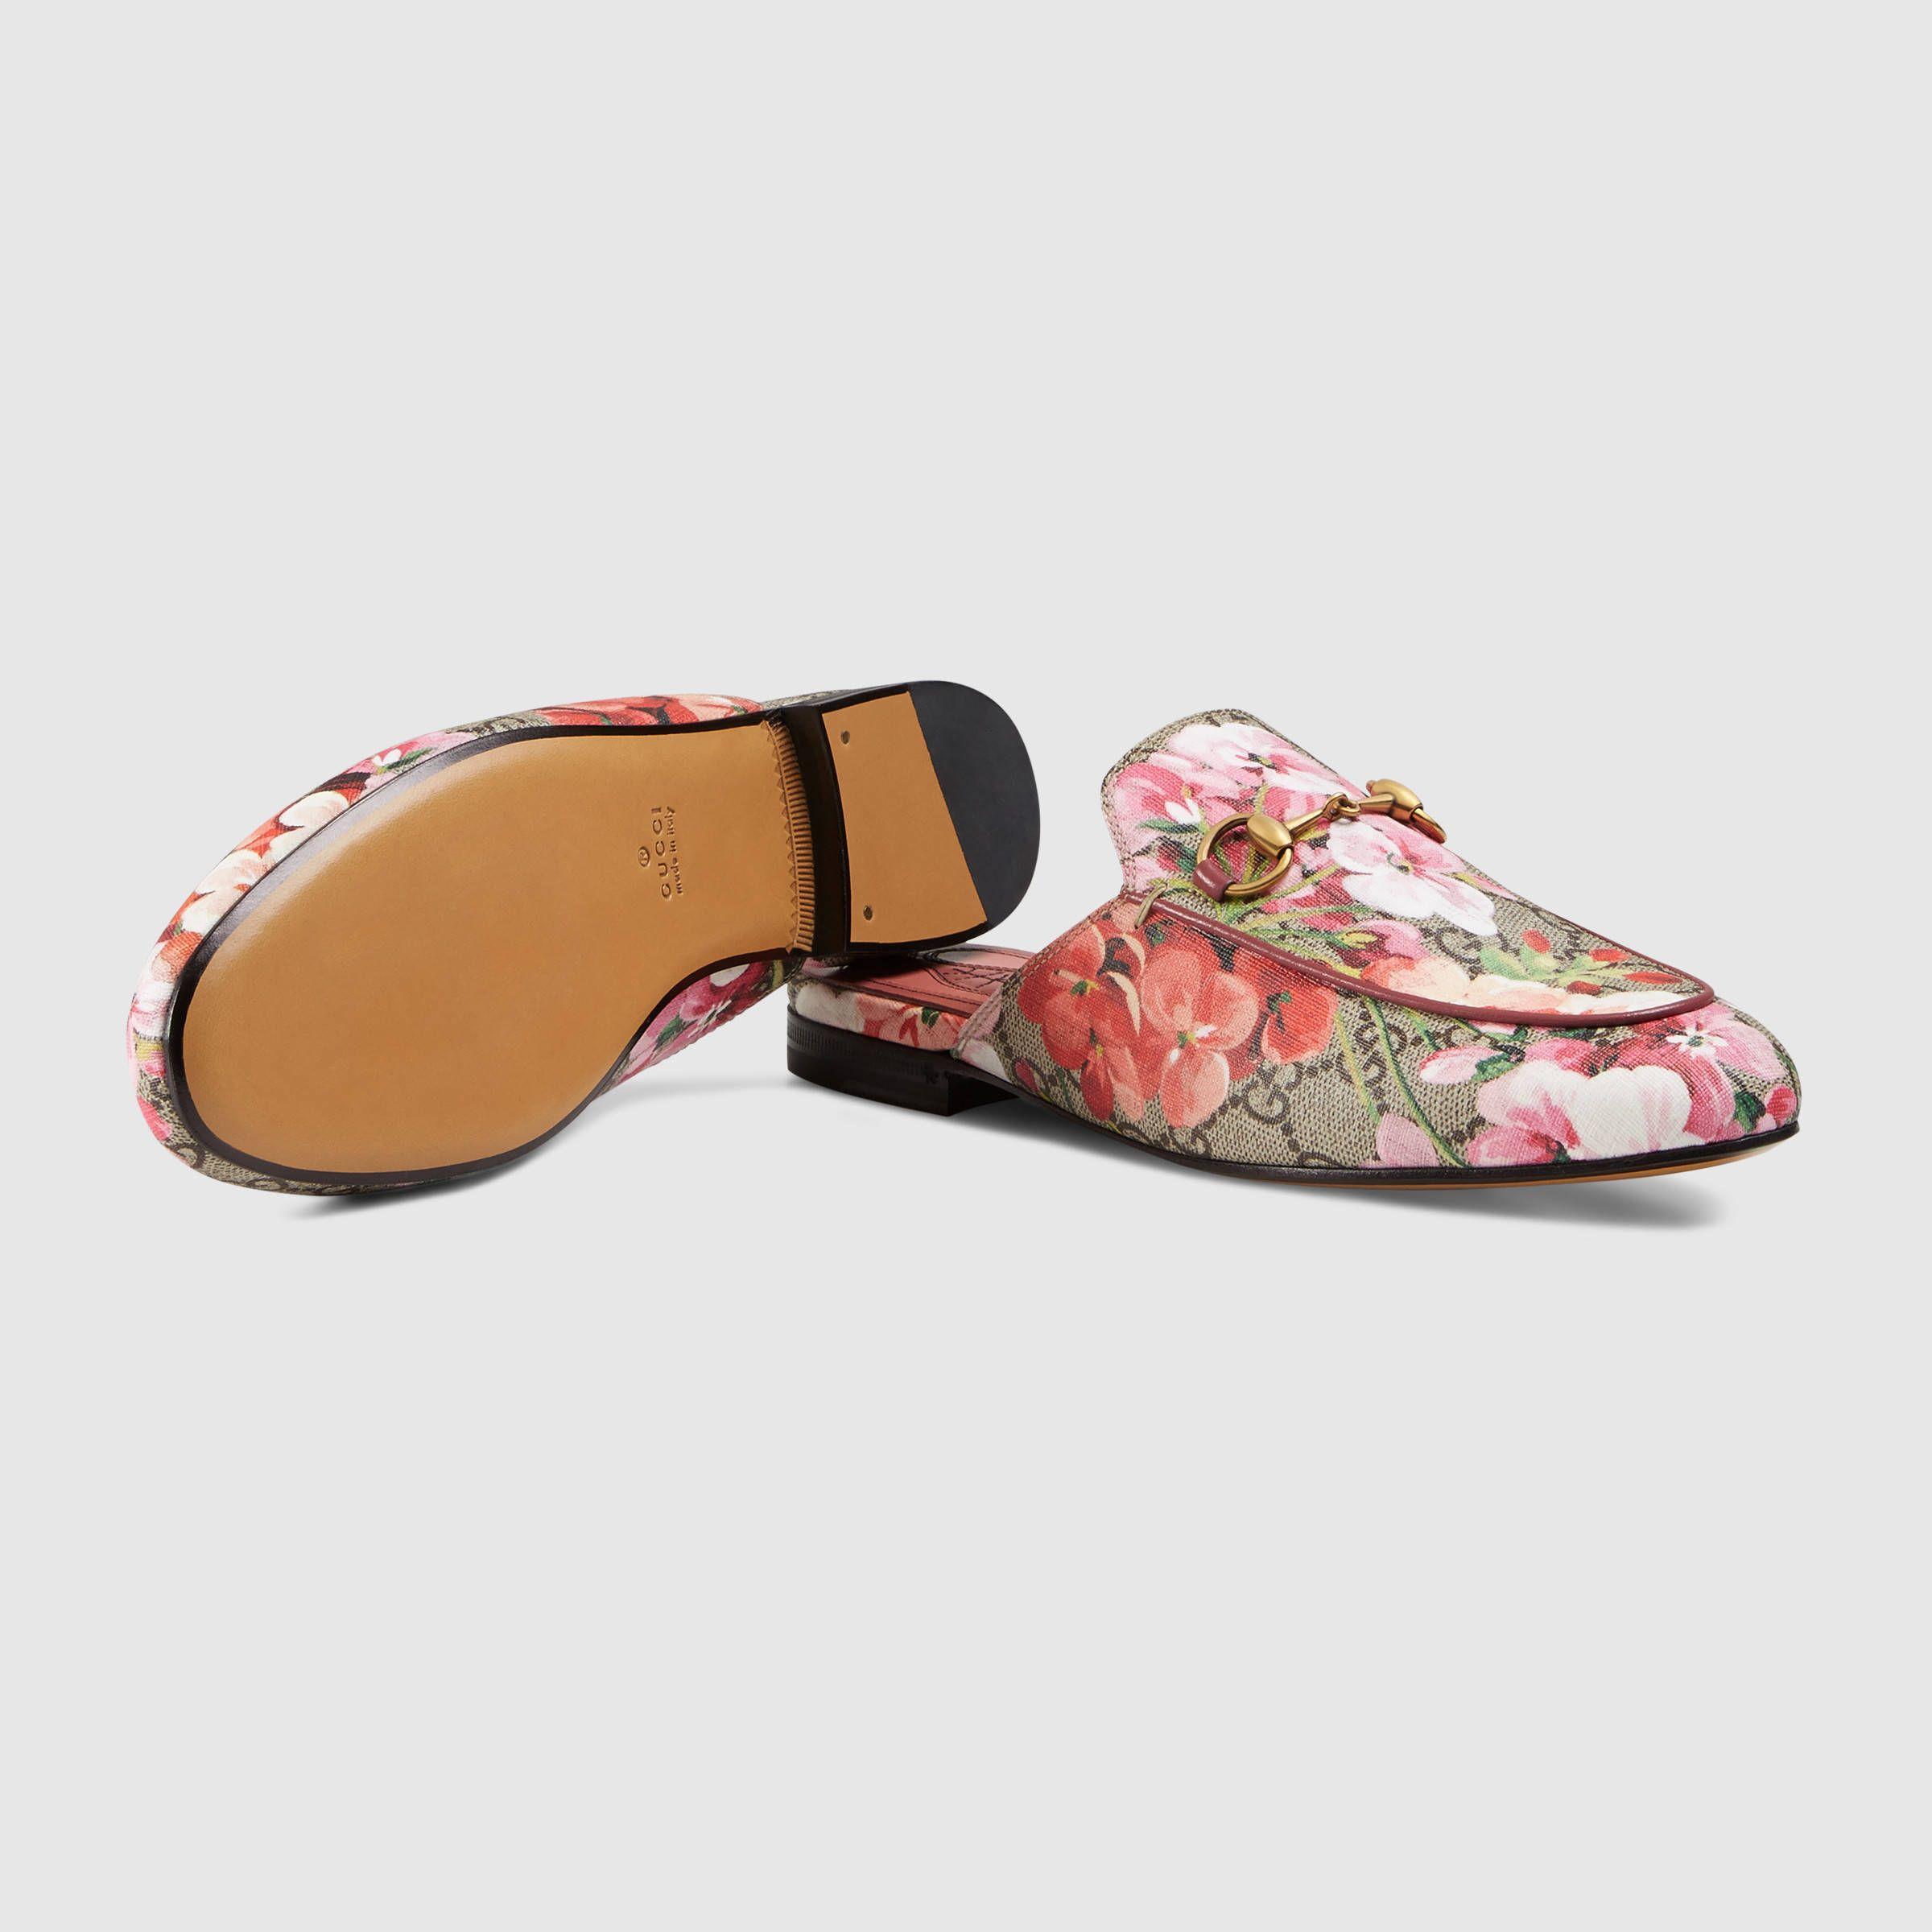 17b46653a25 Gucci Women - Princetown GG Blooms slipper - 432772KU2P08973